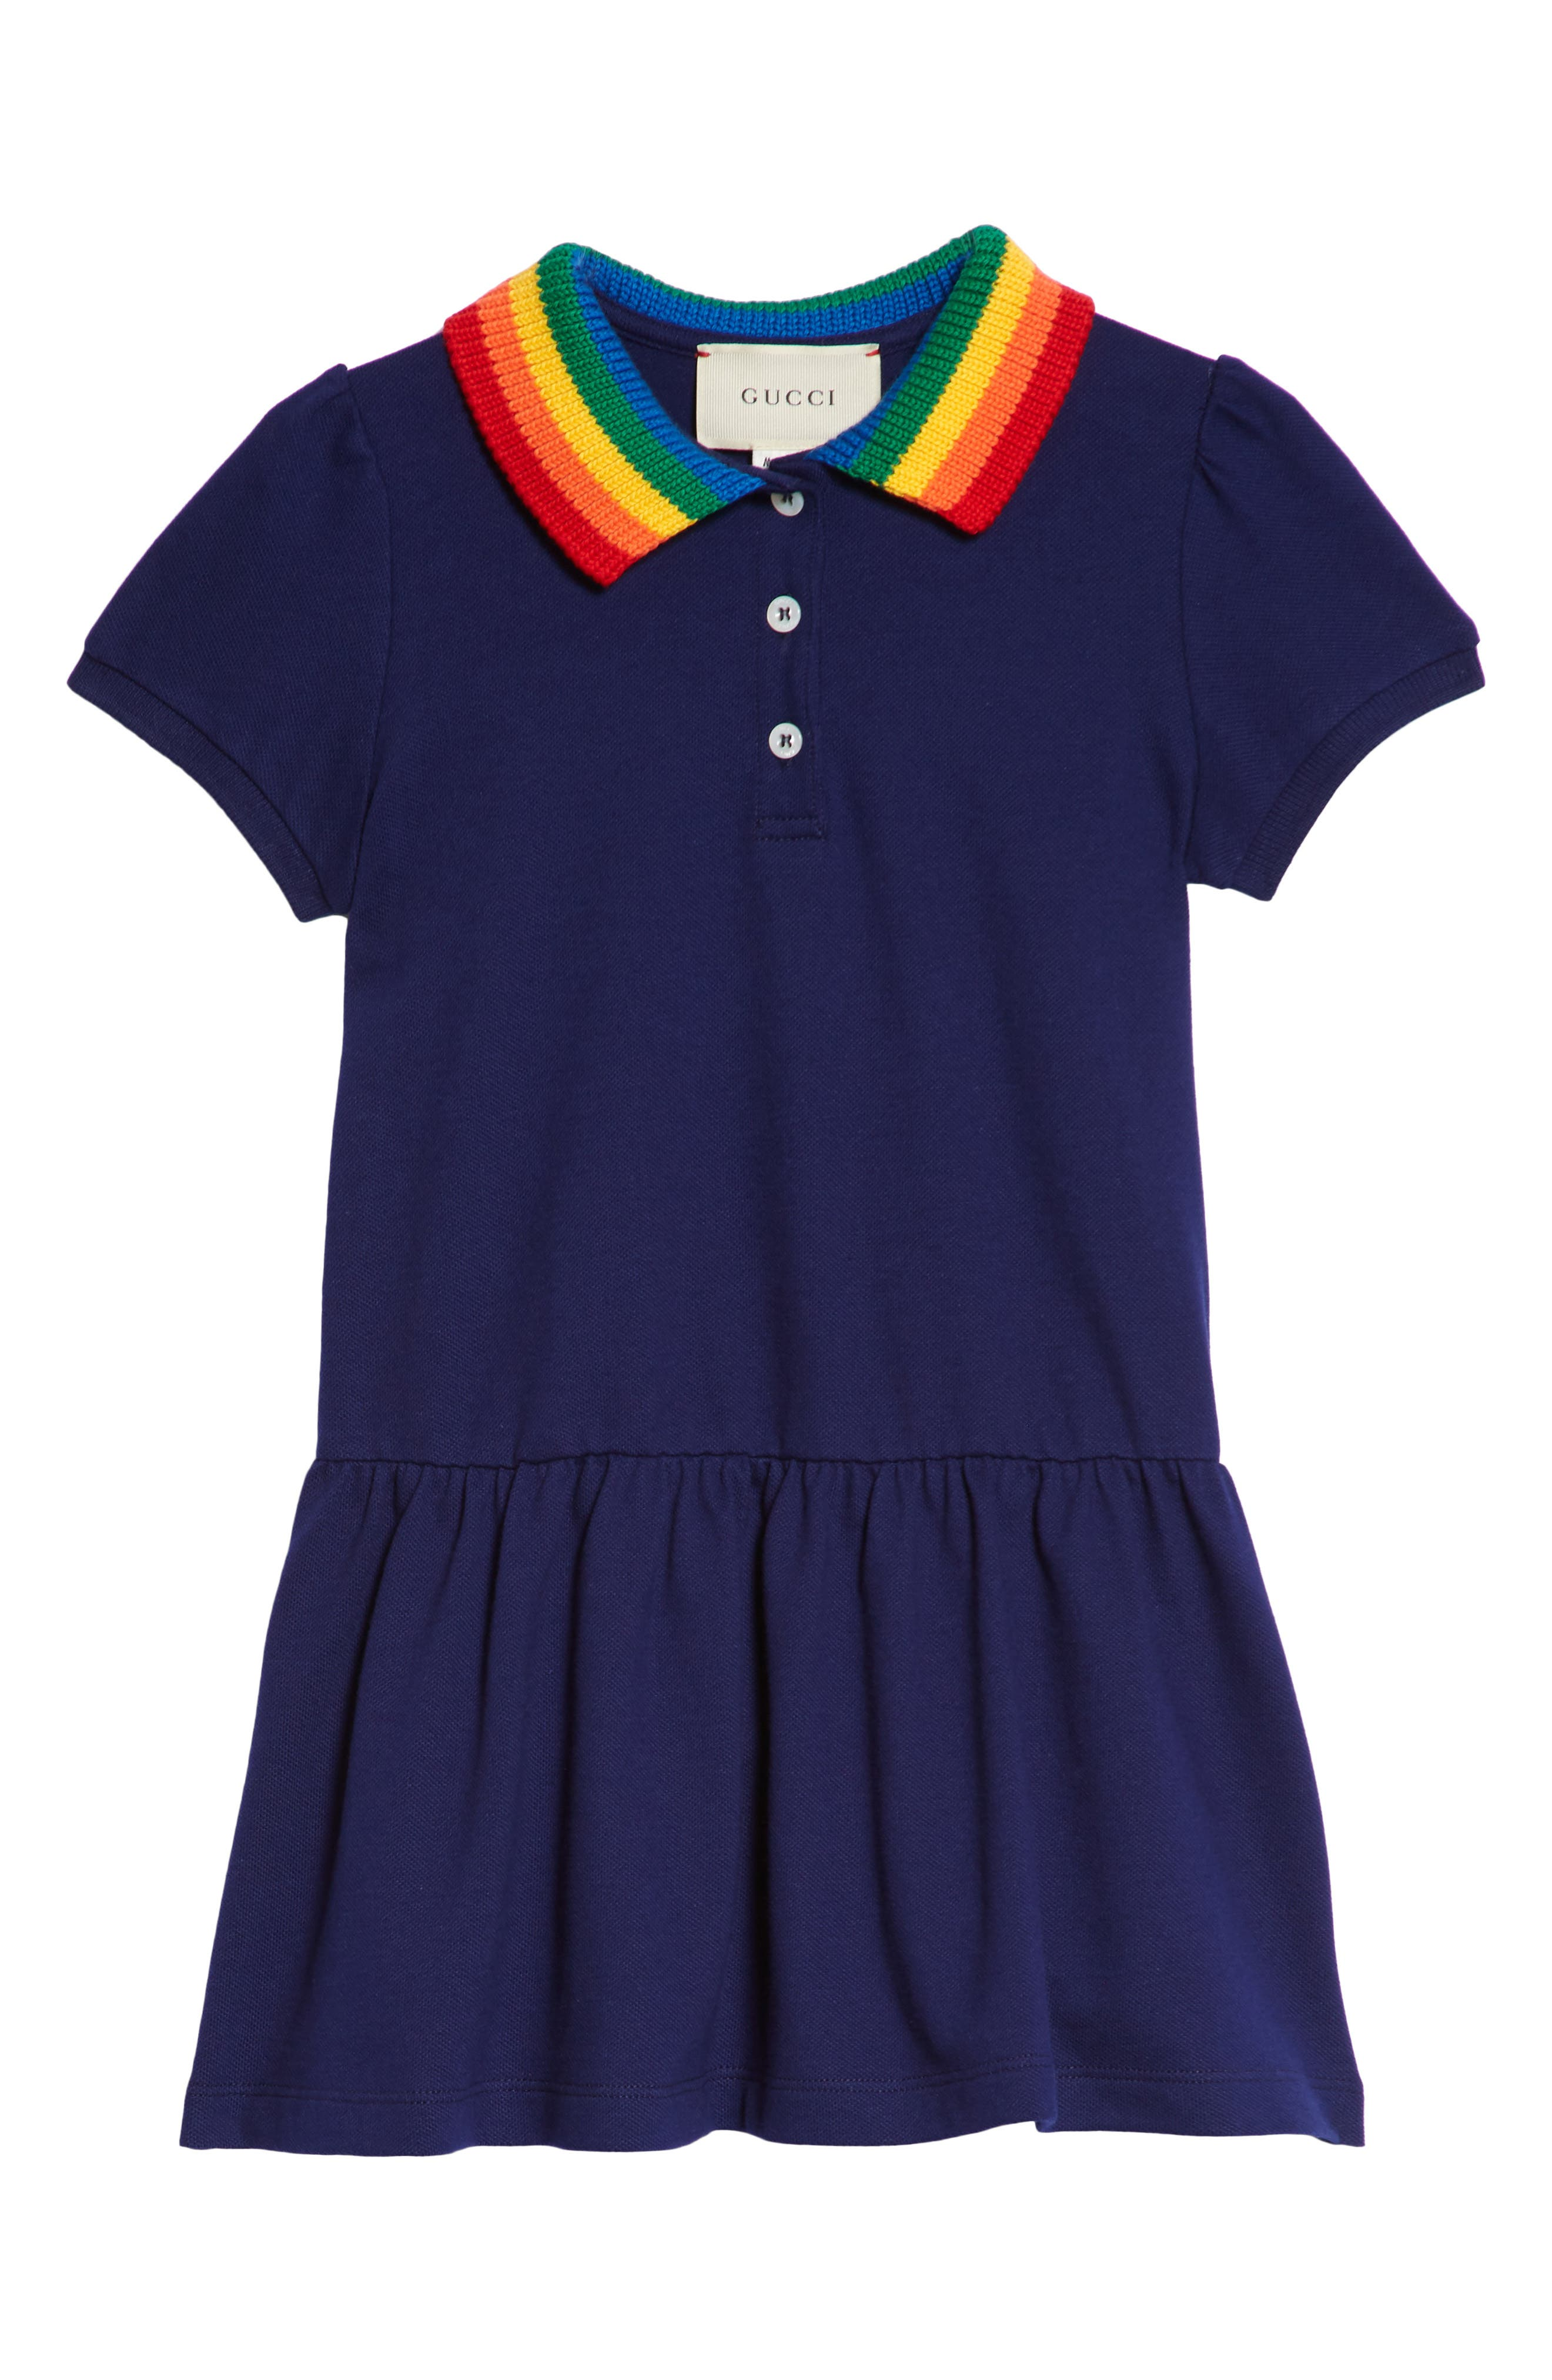 Polo Dress,                         Main,                         color, BLUE MULTI